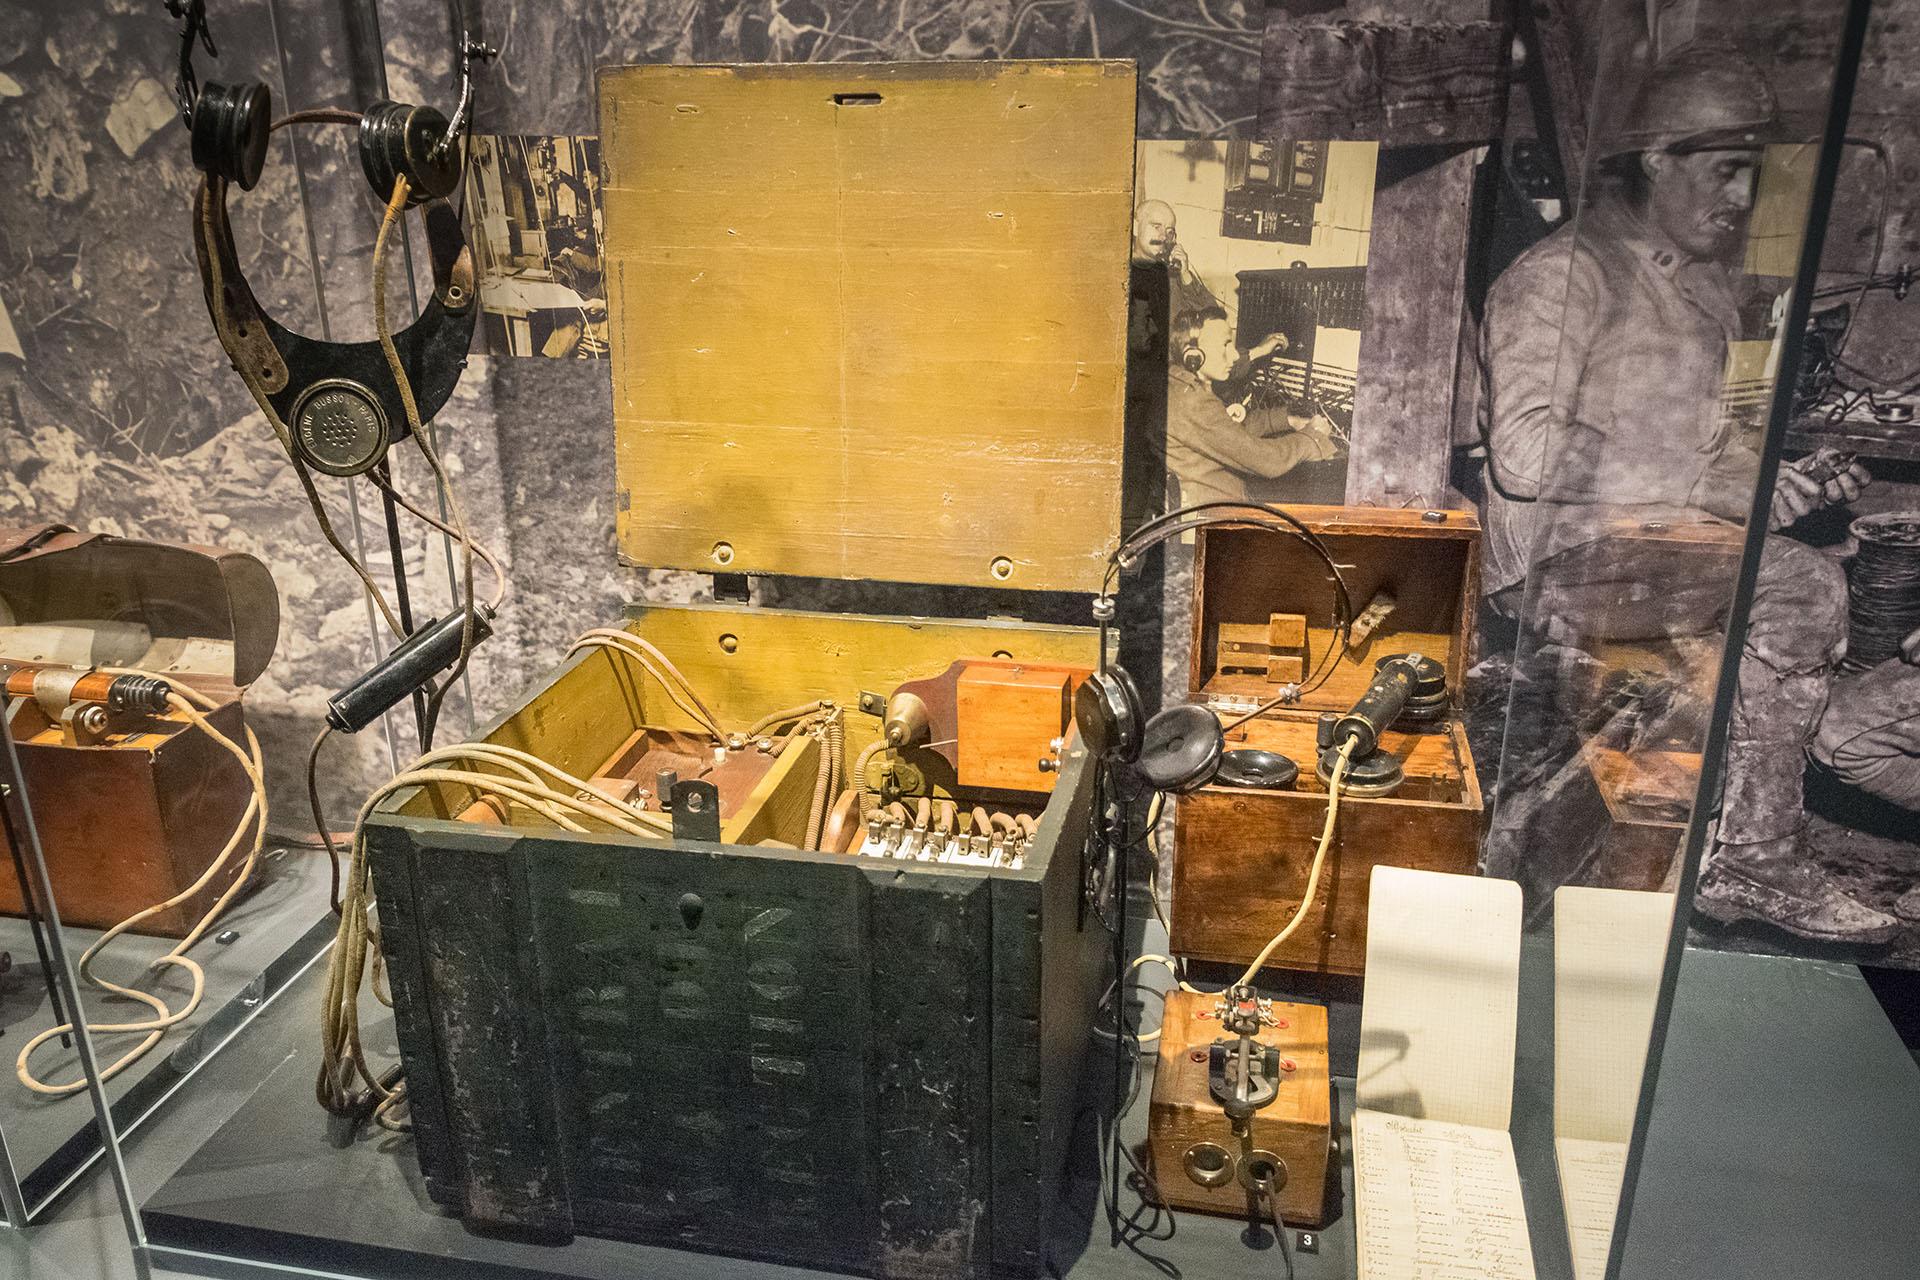 A French radio set displayed at the Verdun Memorial Museum